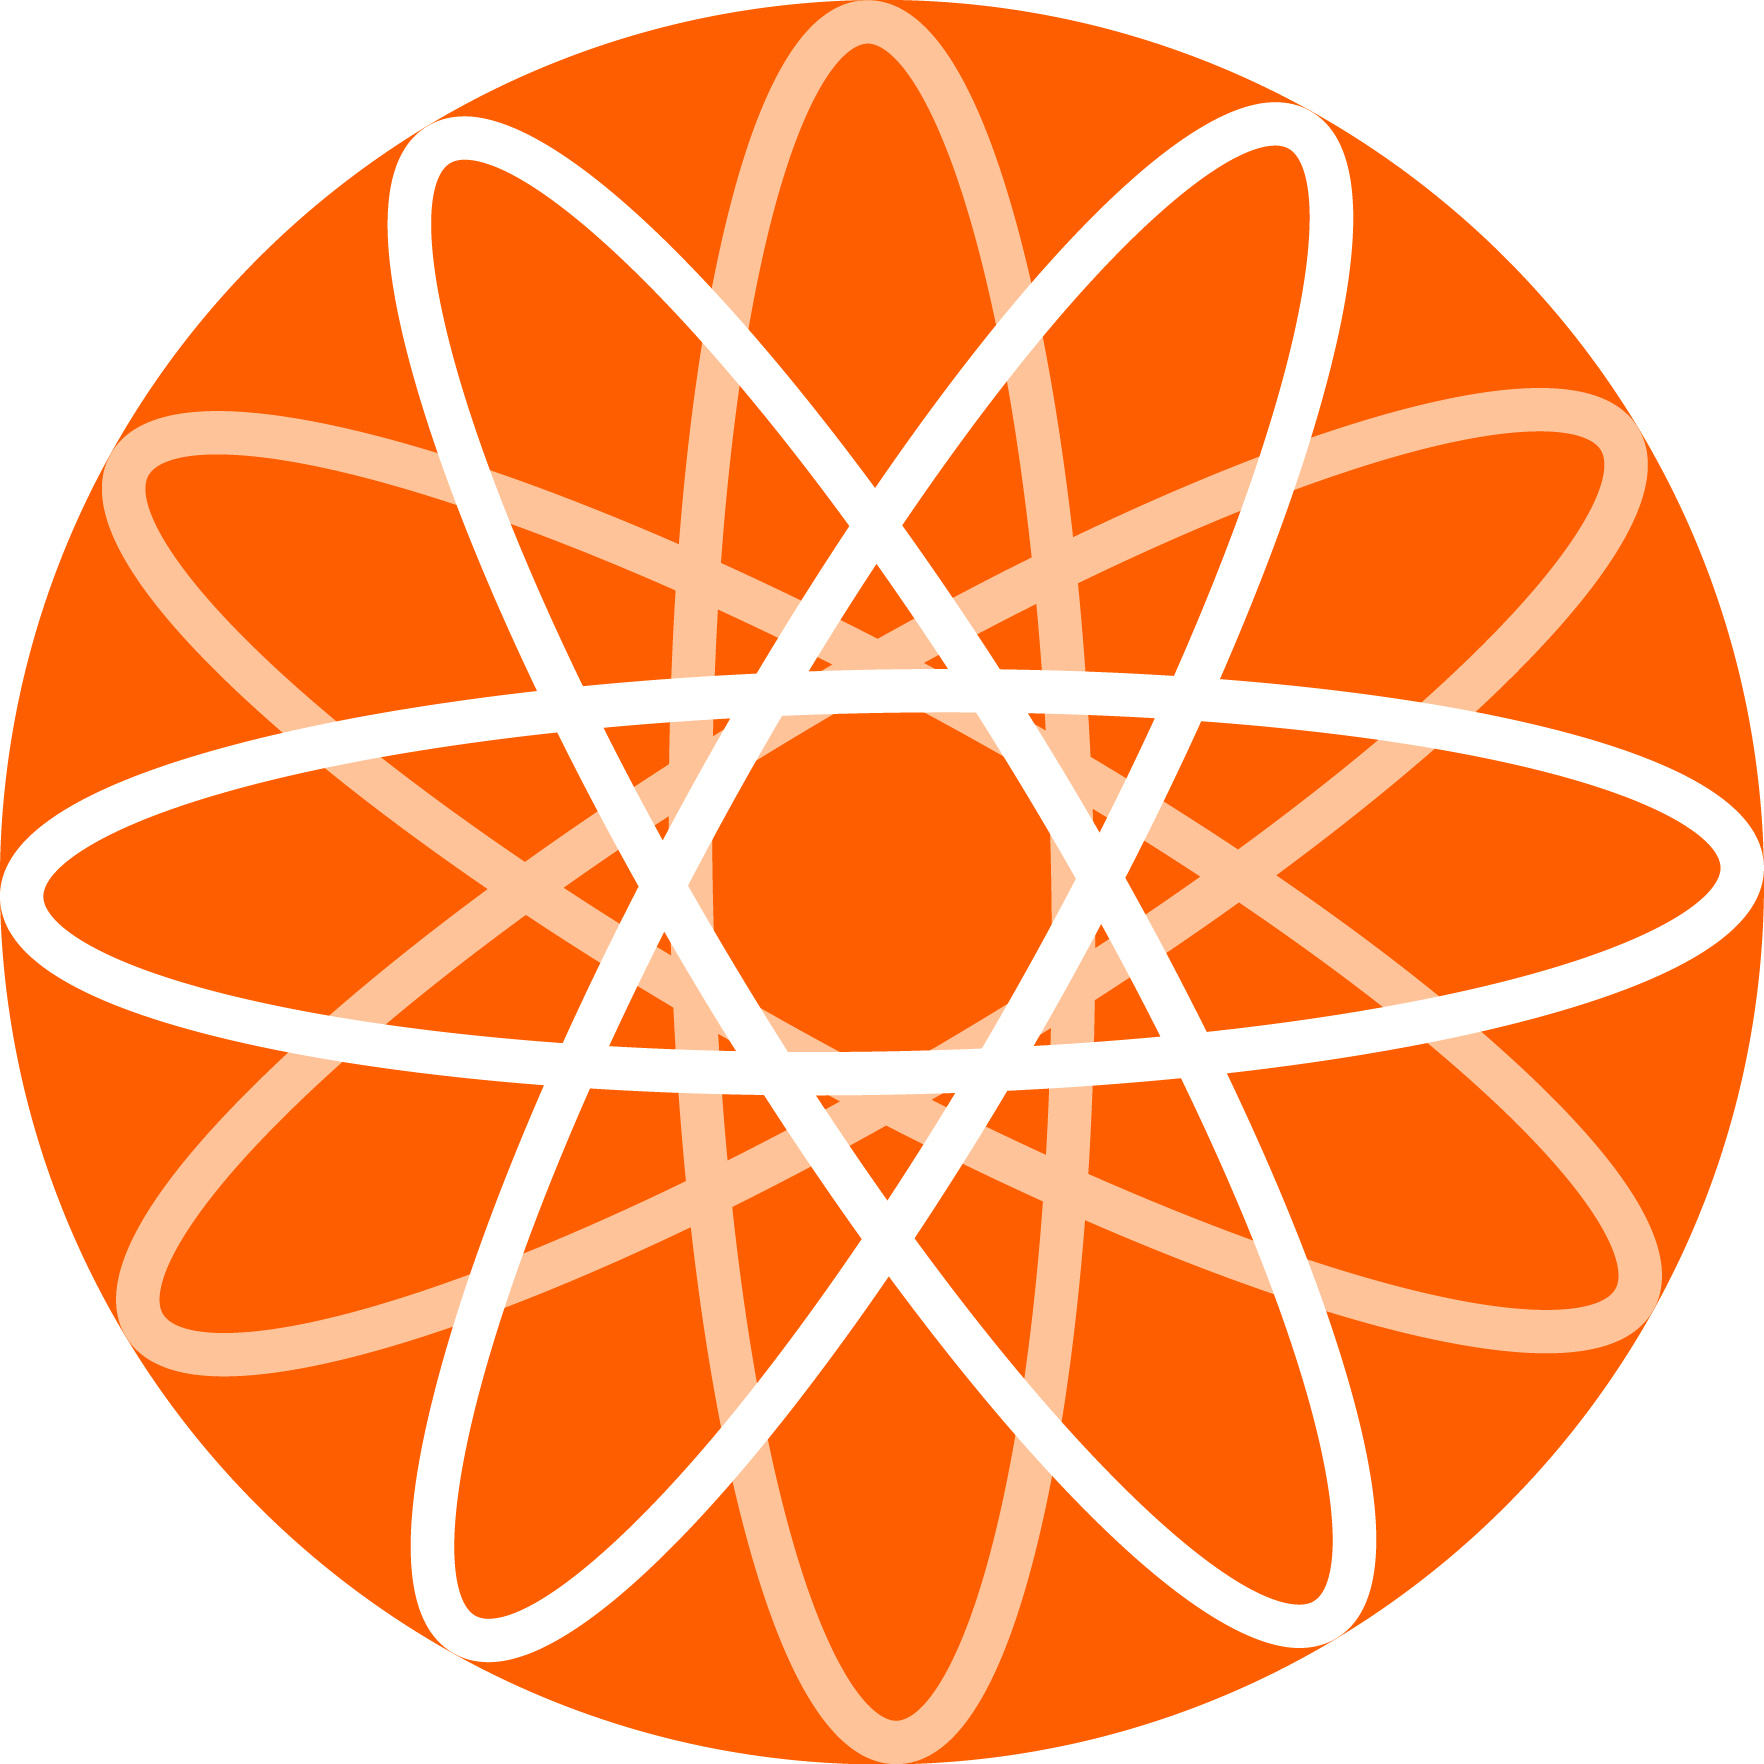 Citizen network logo